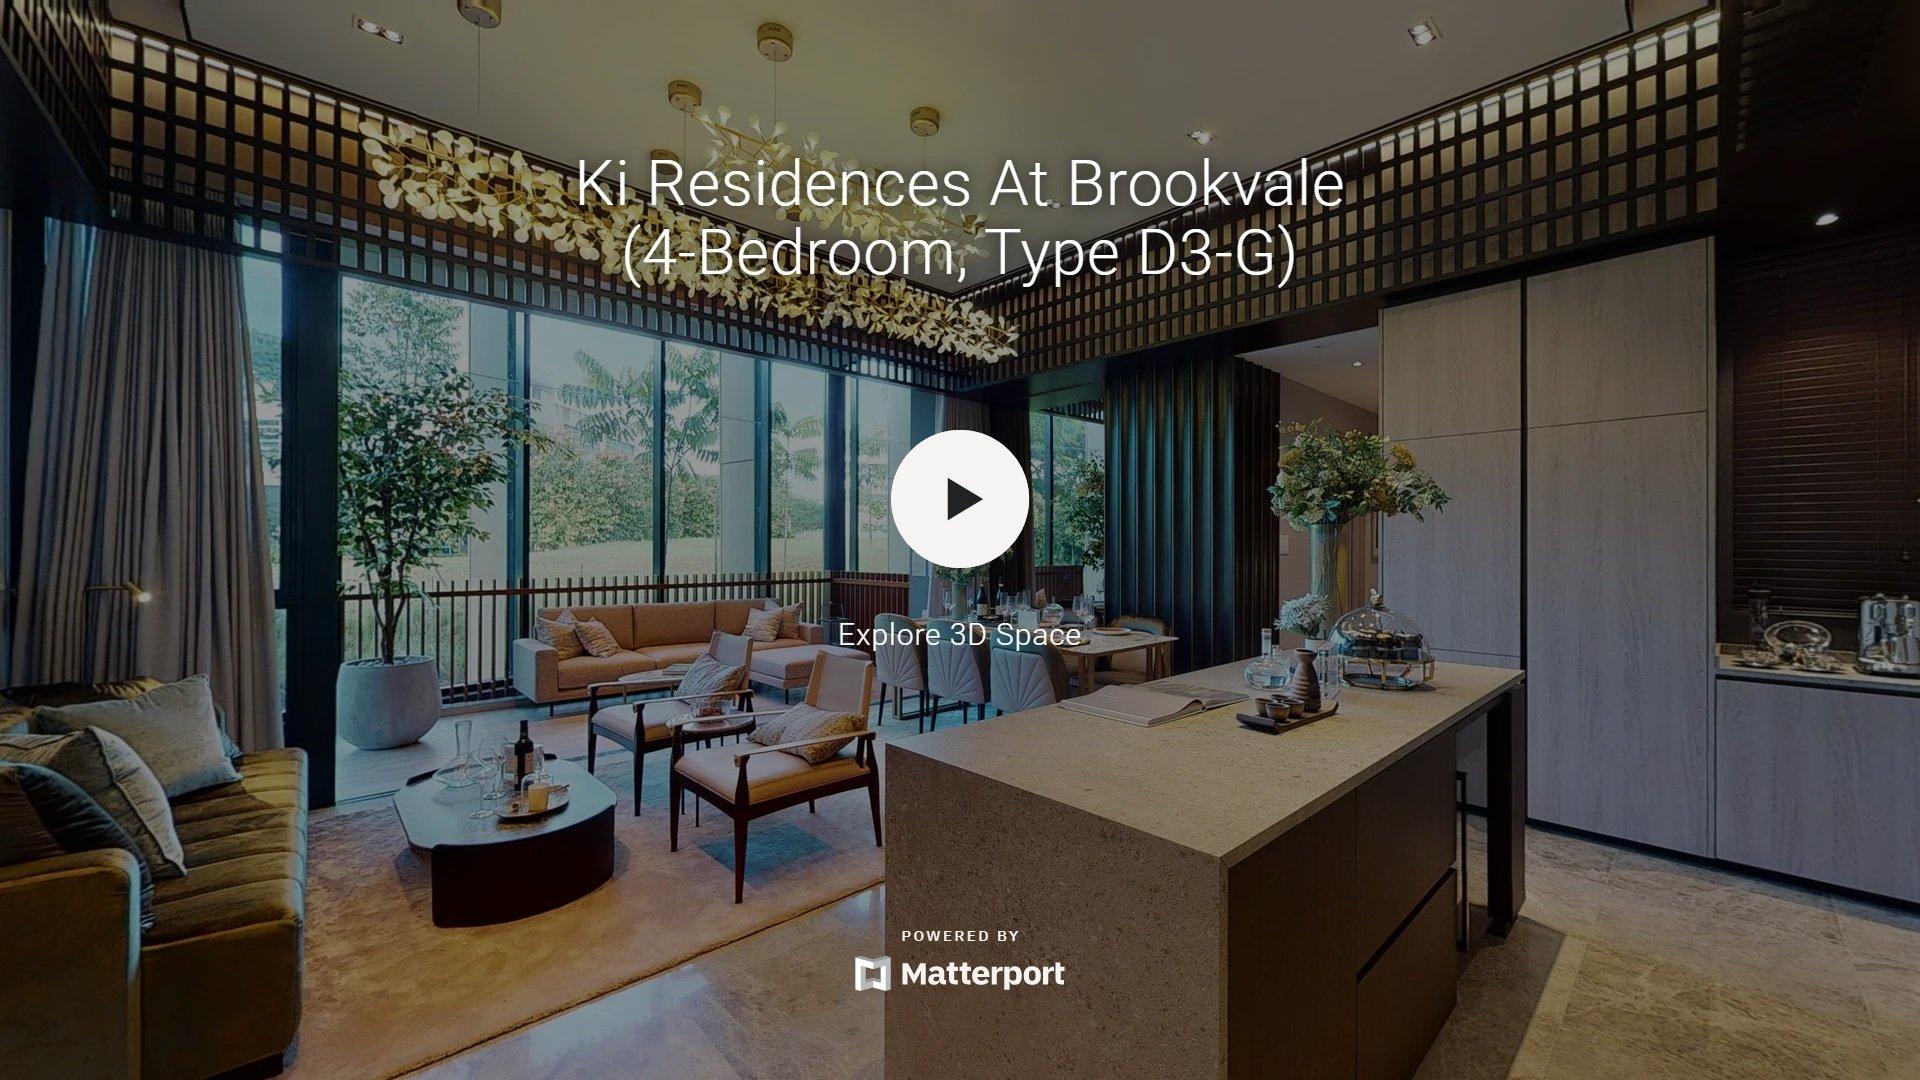 Ki Residences Virtual Tour 4 Bedroom Type D3 G